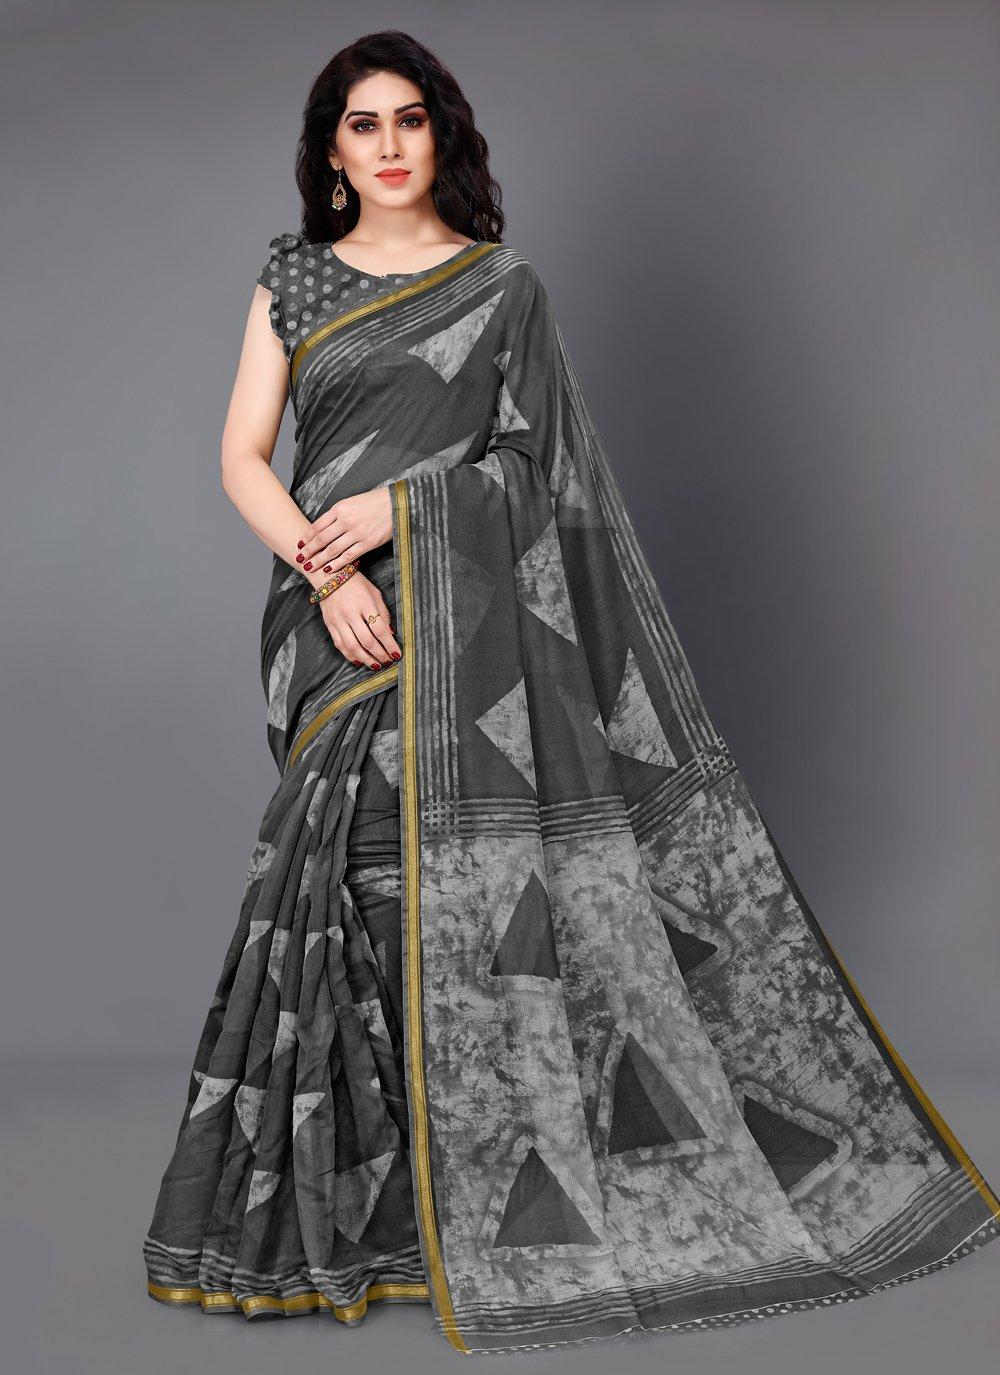 Black and Grey Cotton Party Trendy Saree